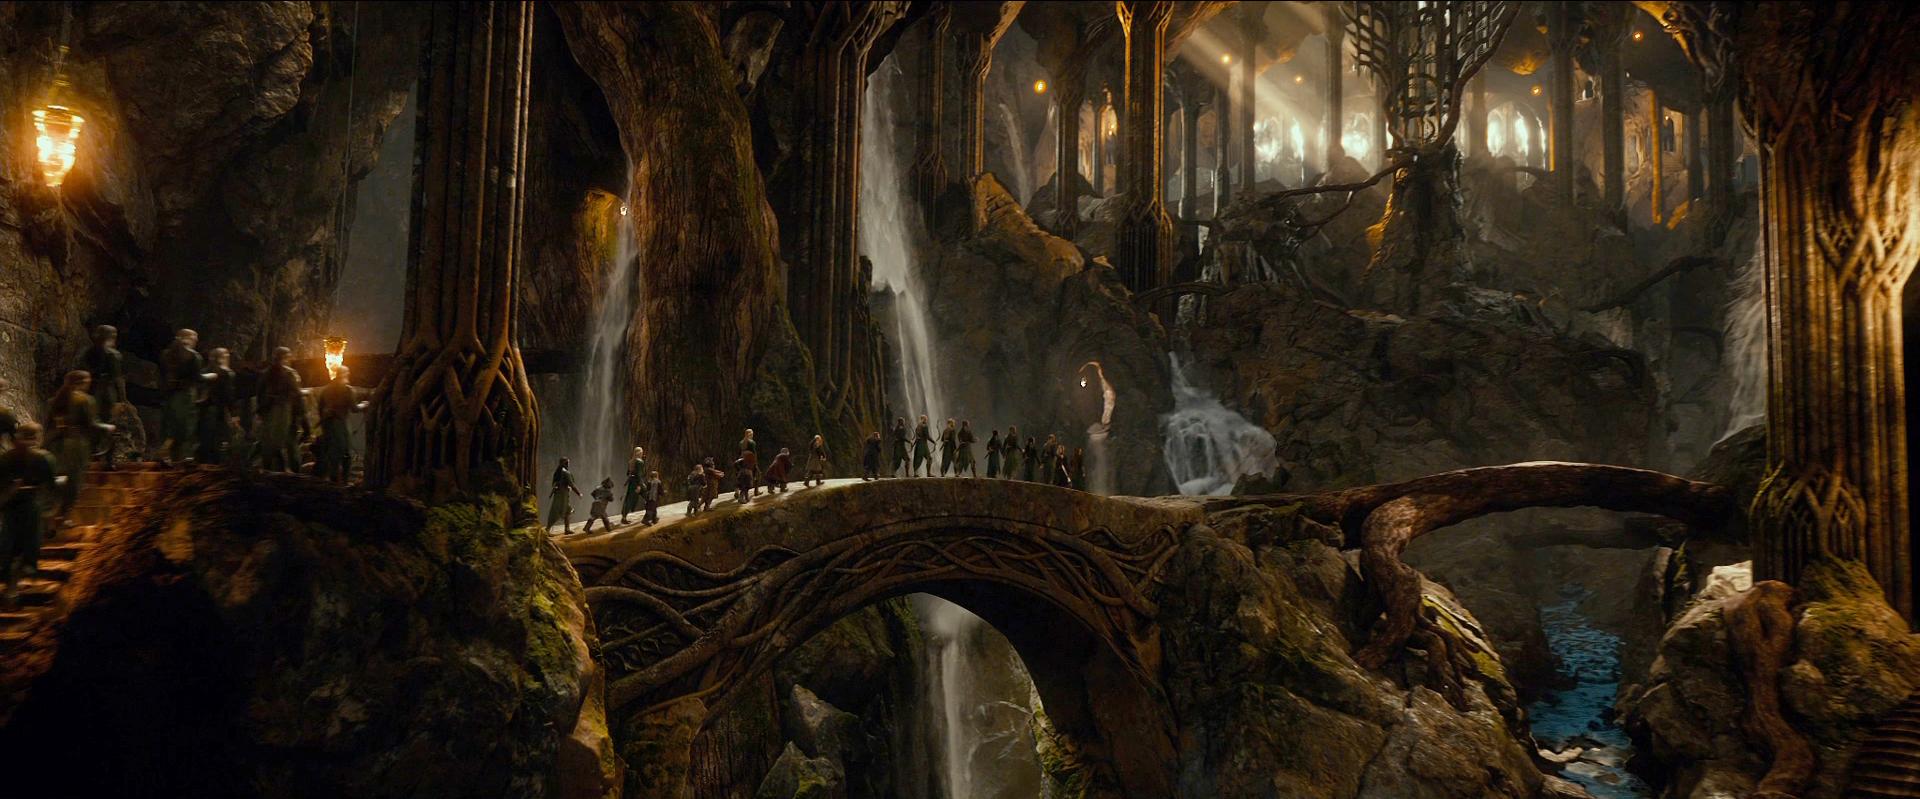 The Hobbit Trailer Analysis  The Desolation of Smaug  Hobbit